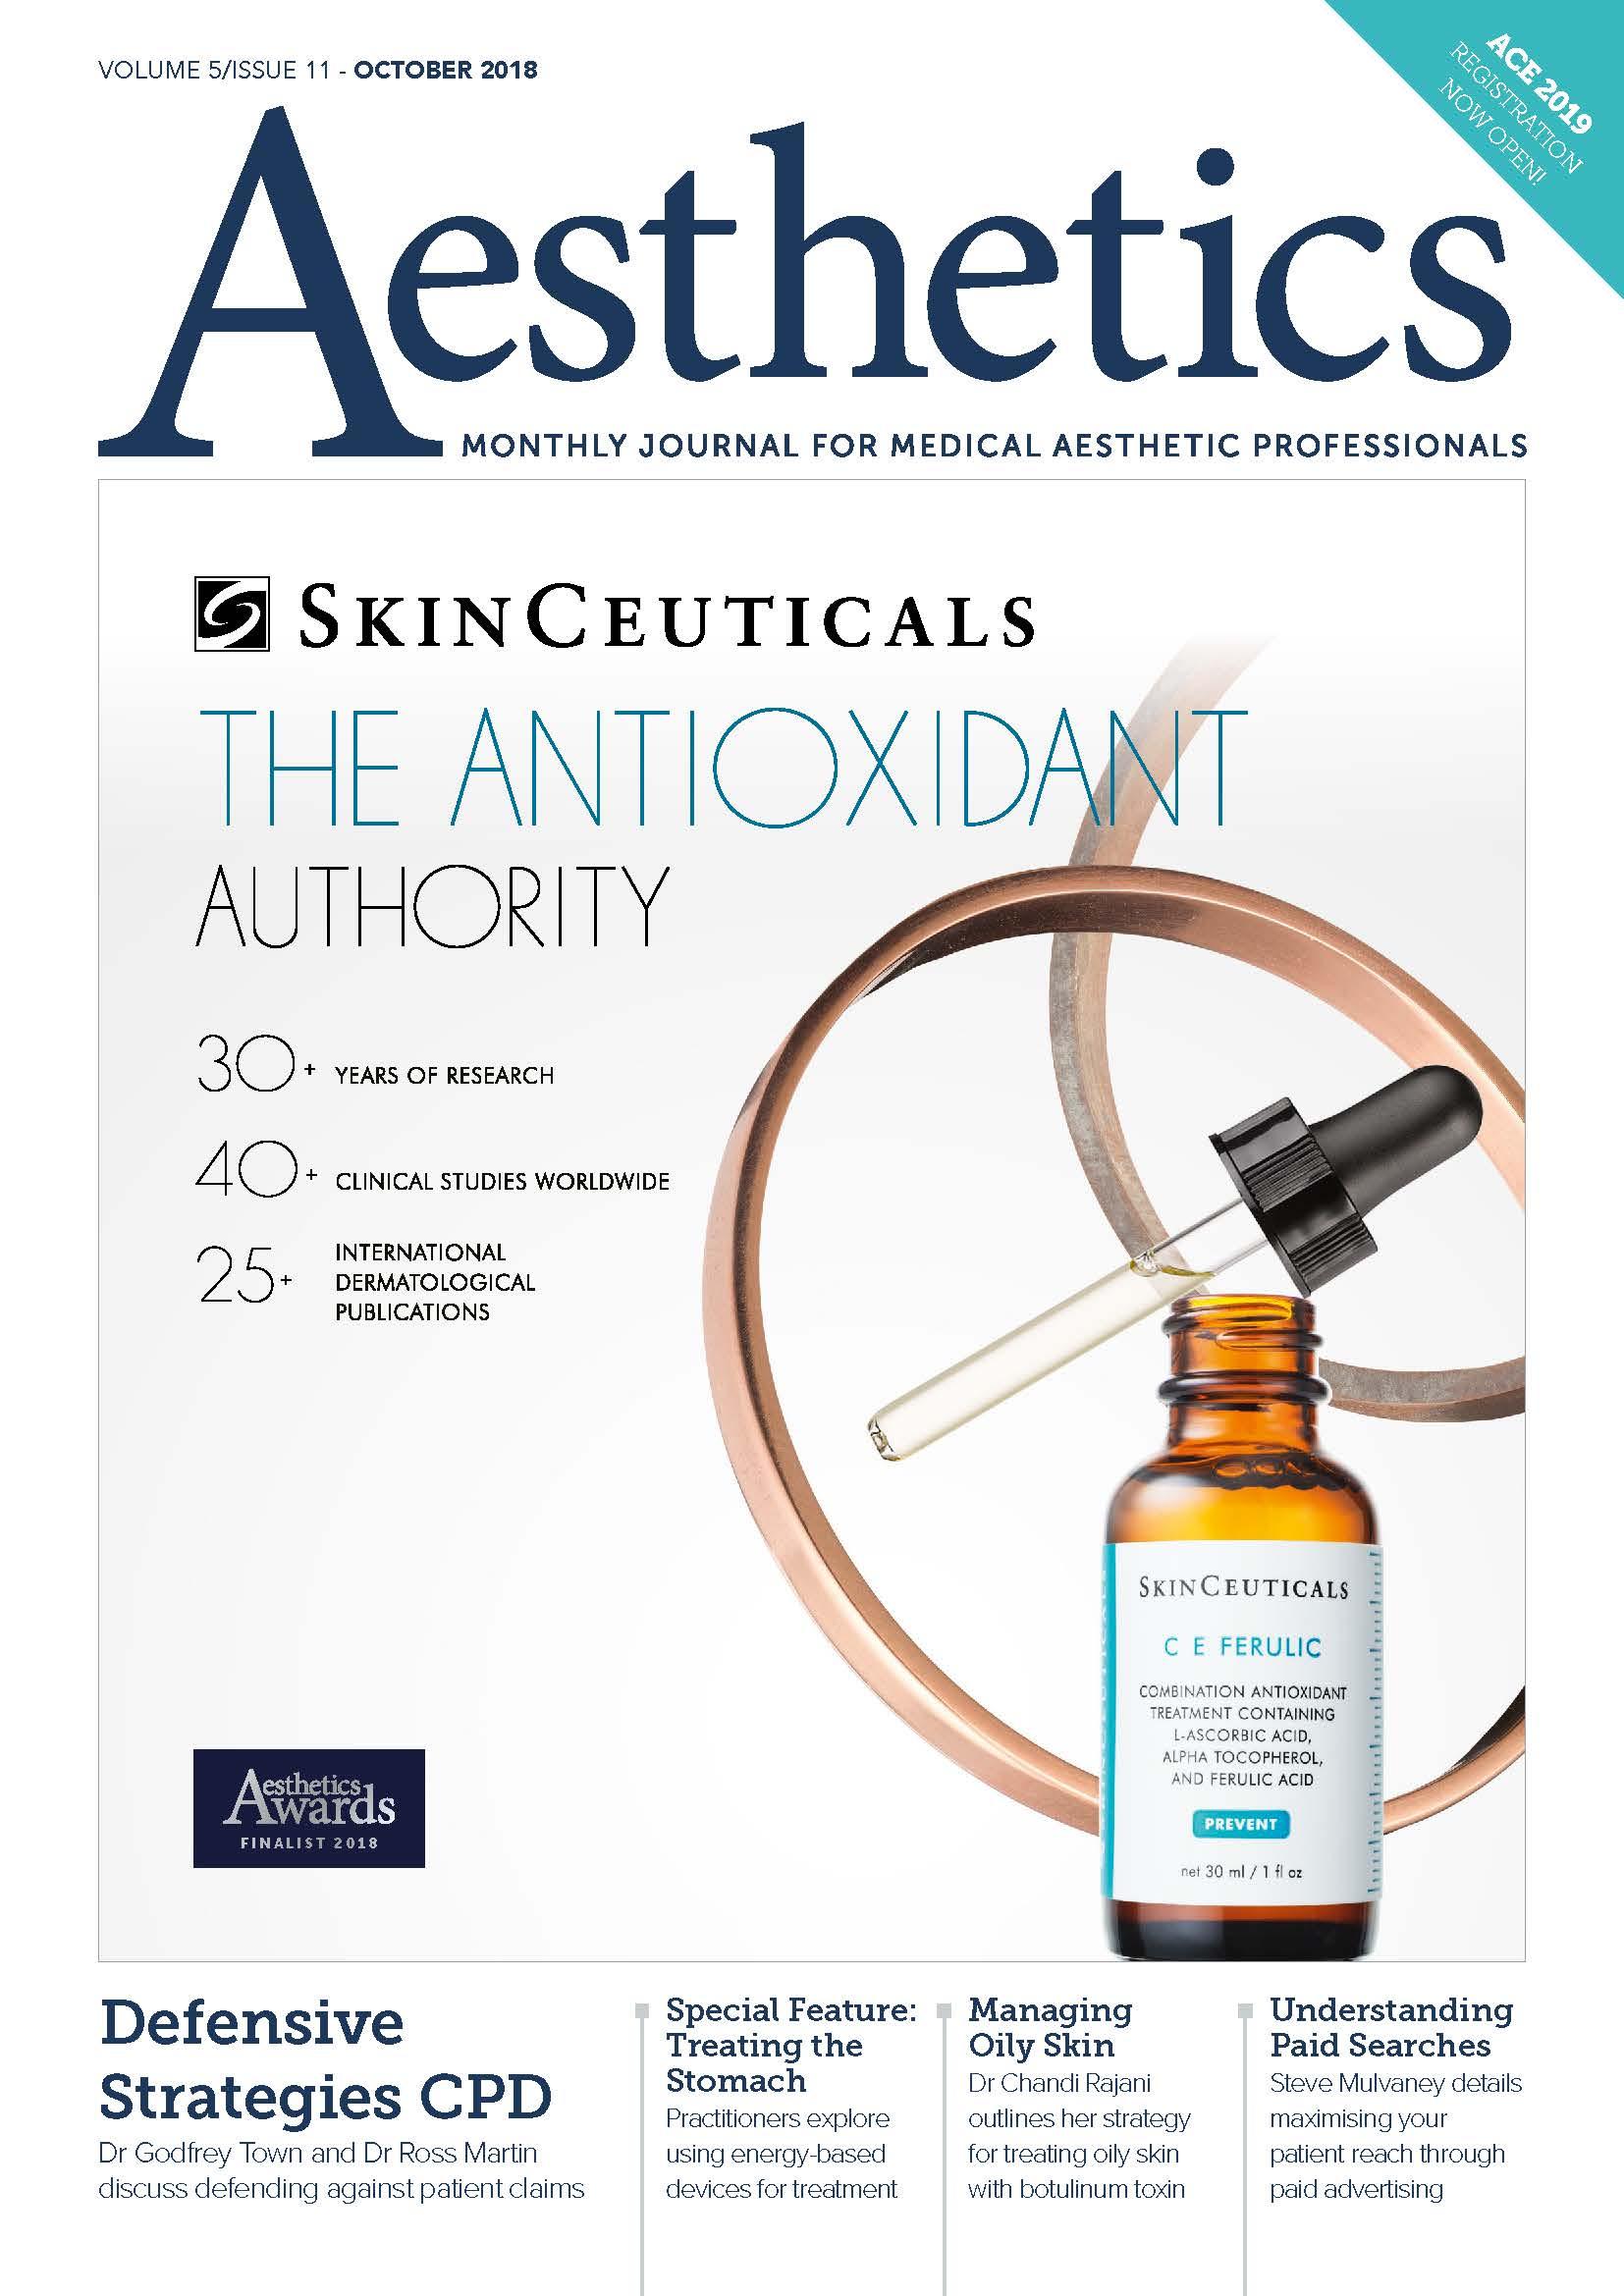 Aesthetics Magazine--Implementing Efficient Defensive Strategies